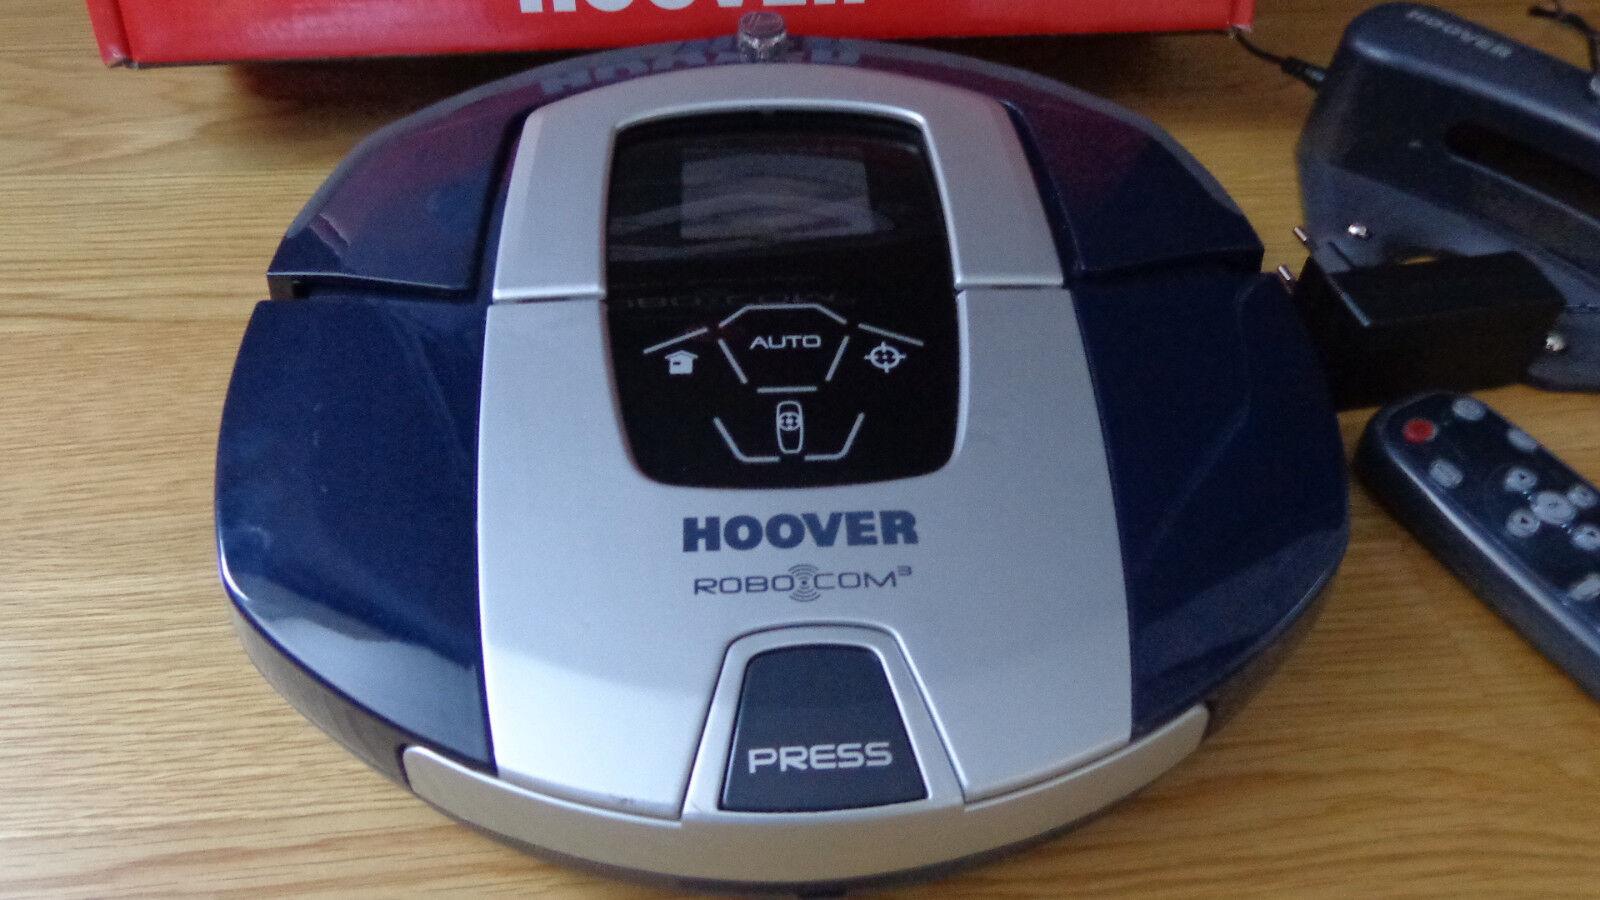 Aspirateur robot HOOVER RBC30 ROBOCOM3 LITHIUM